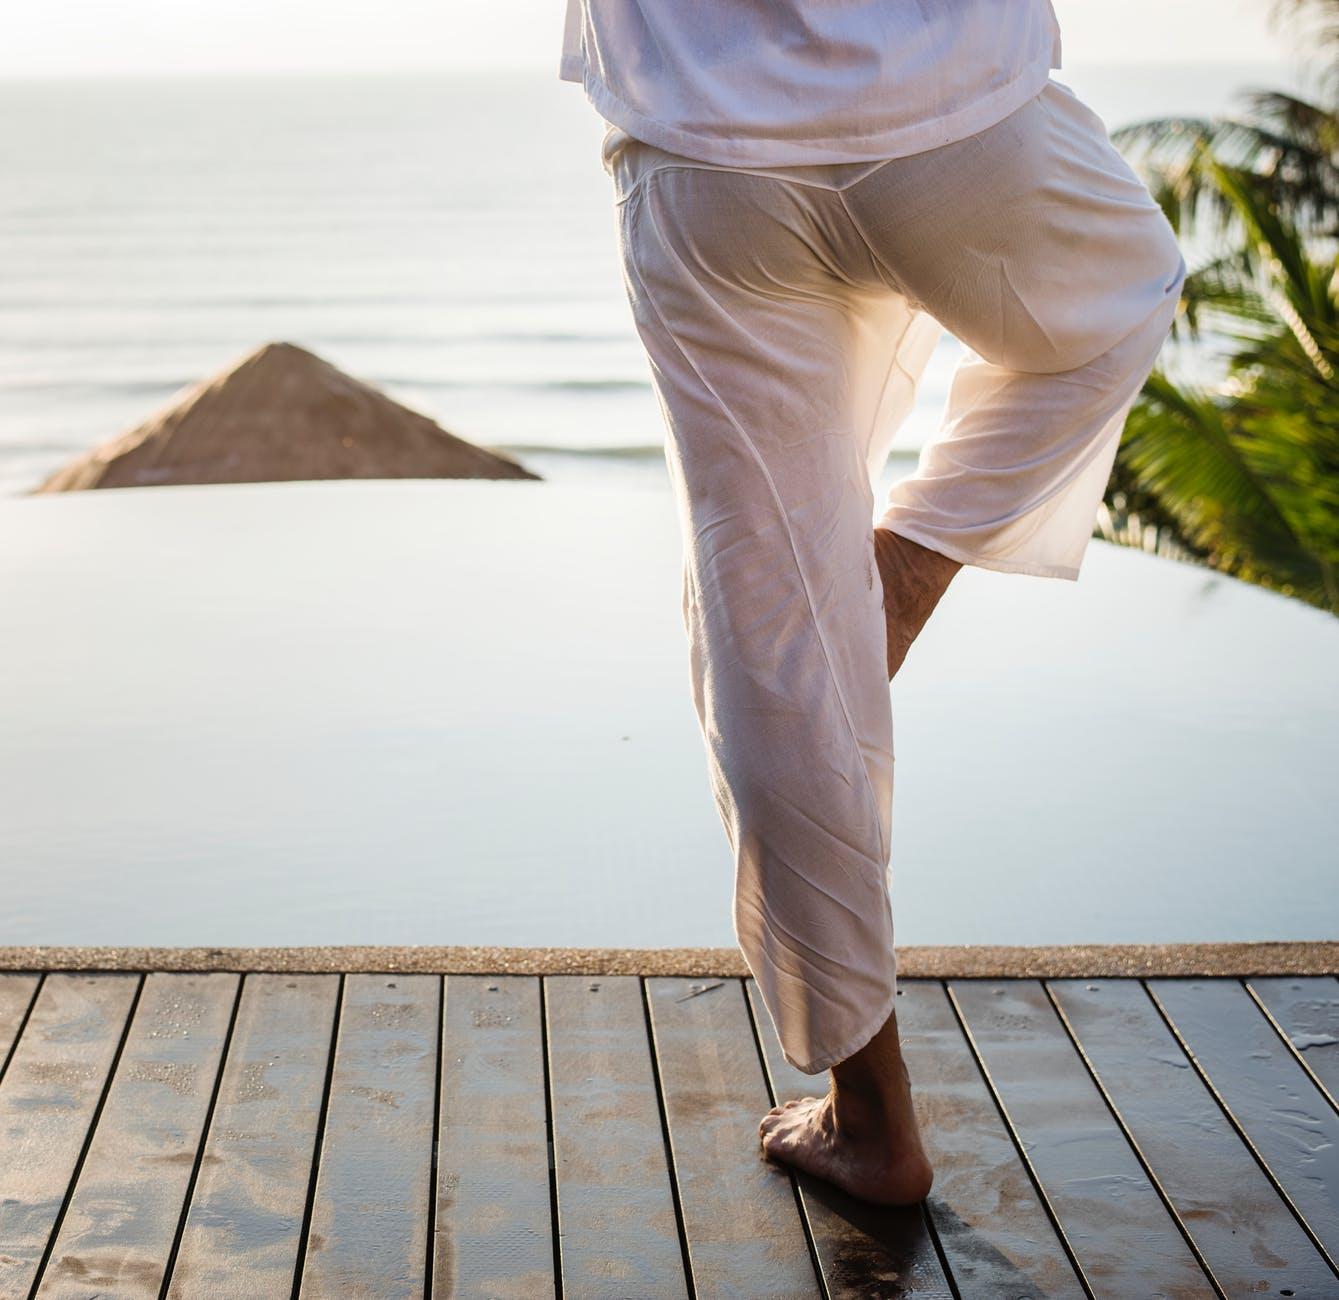 person standing on boardwalk